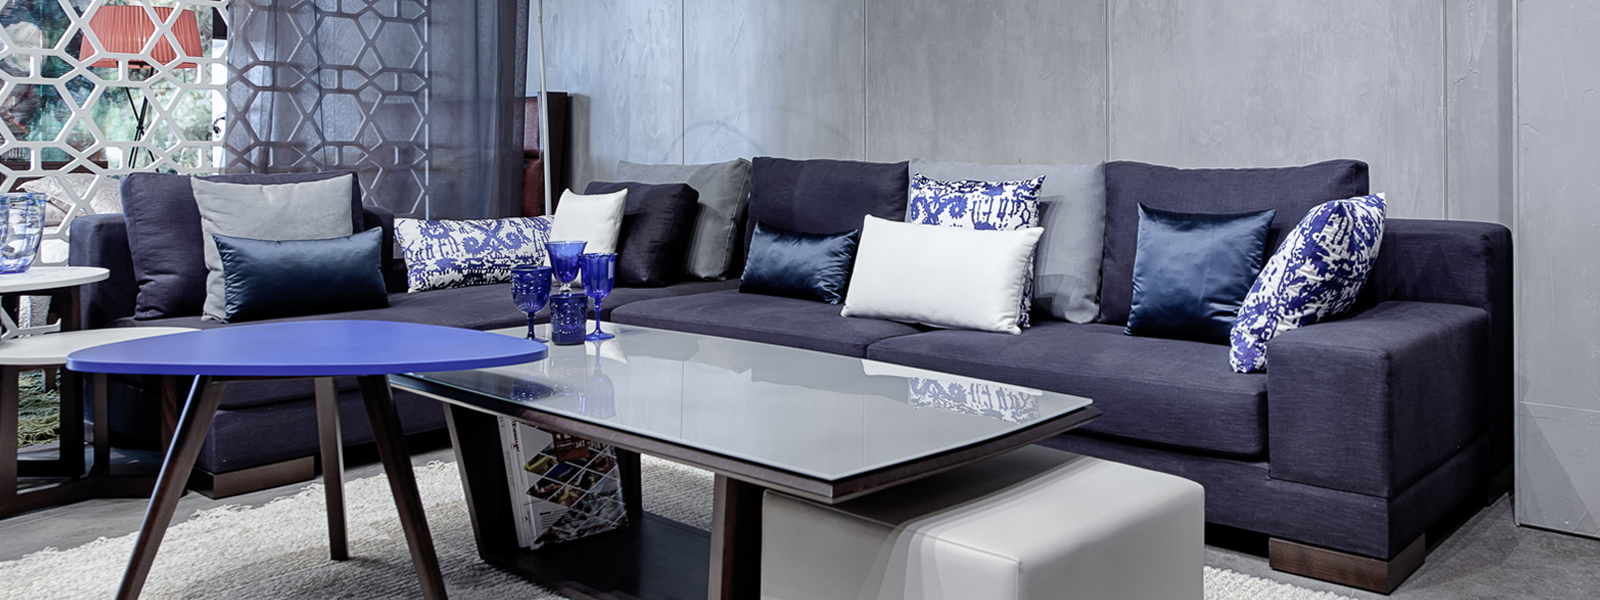 DND Furniture